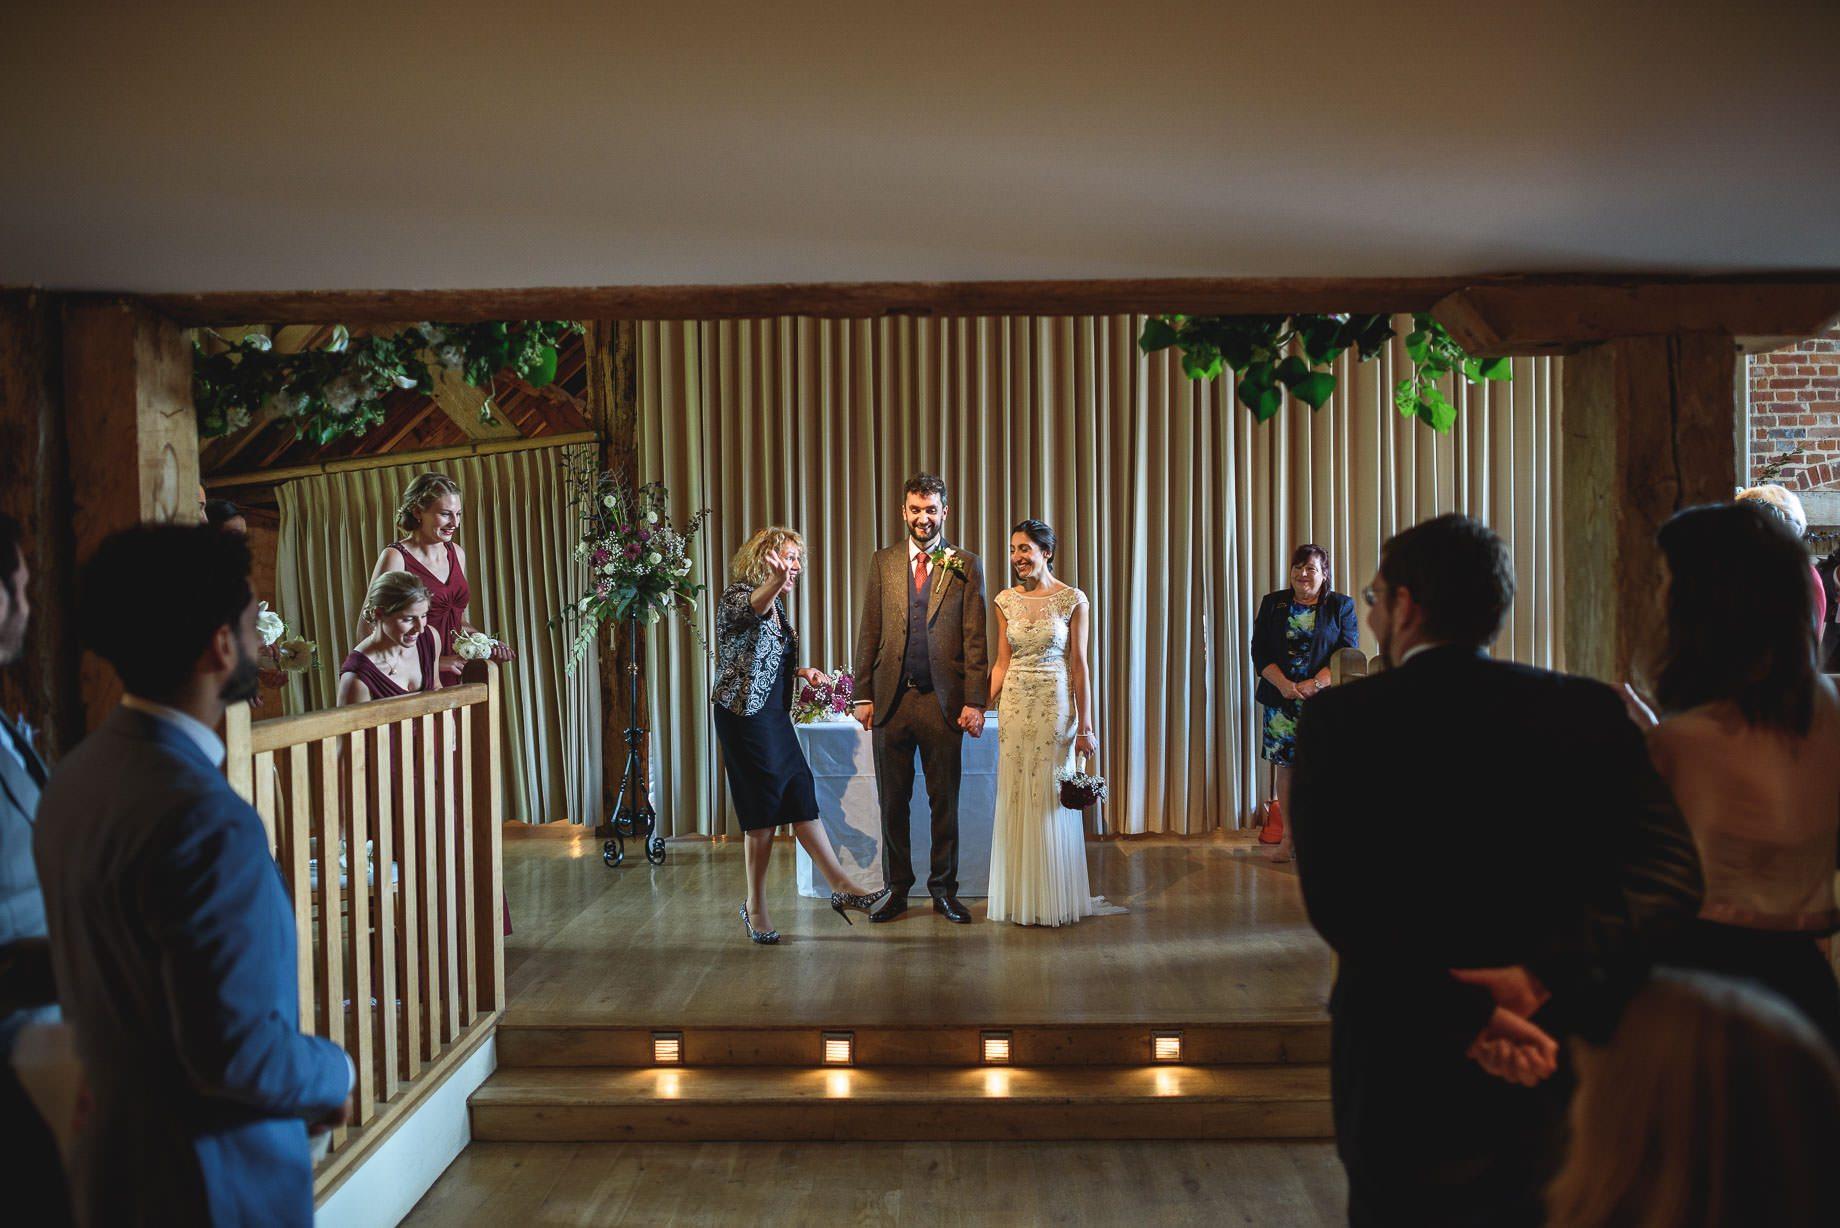 bury-court-barn-wedding-photography-guy-collier-photography-nadia-tom-65-of-184